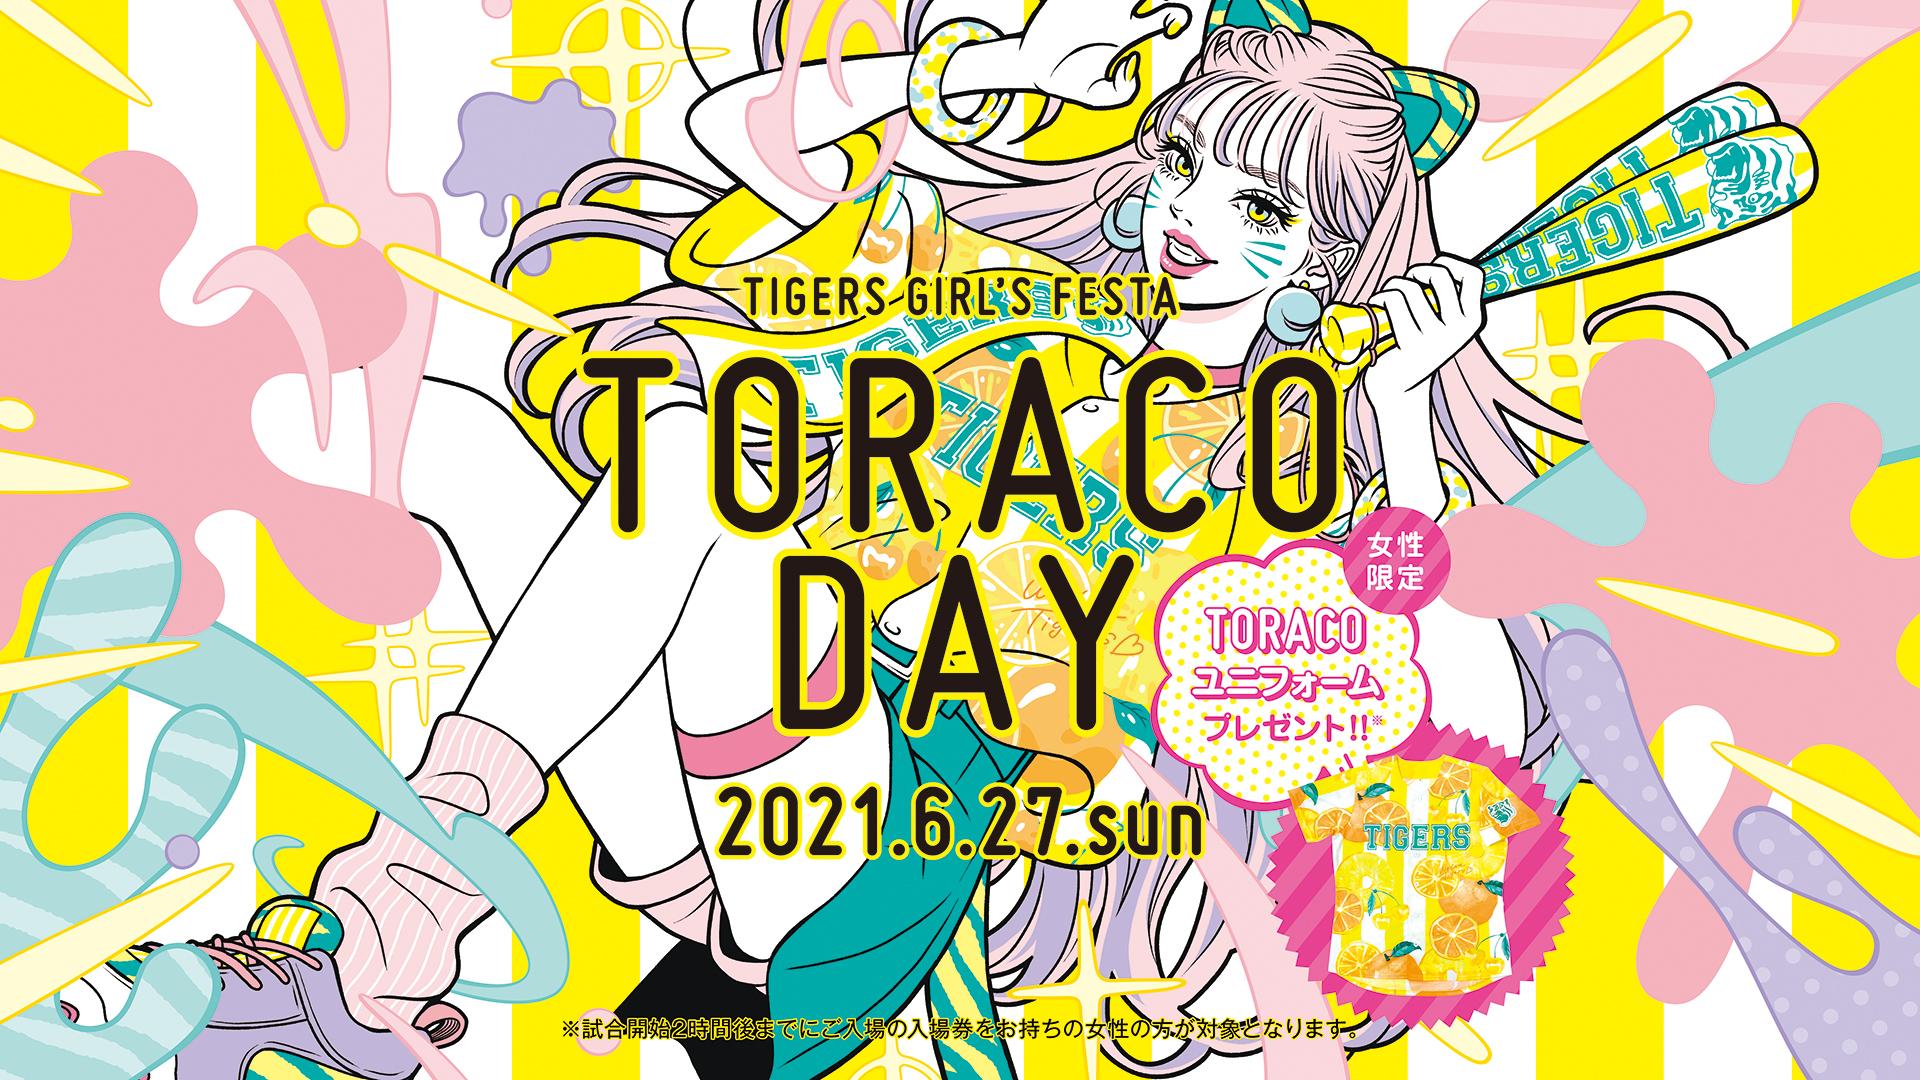 TORACO 2021